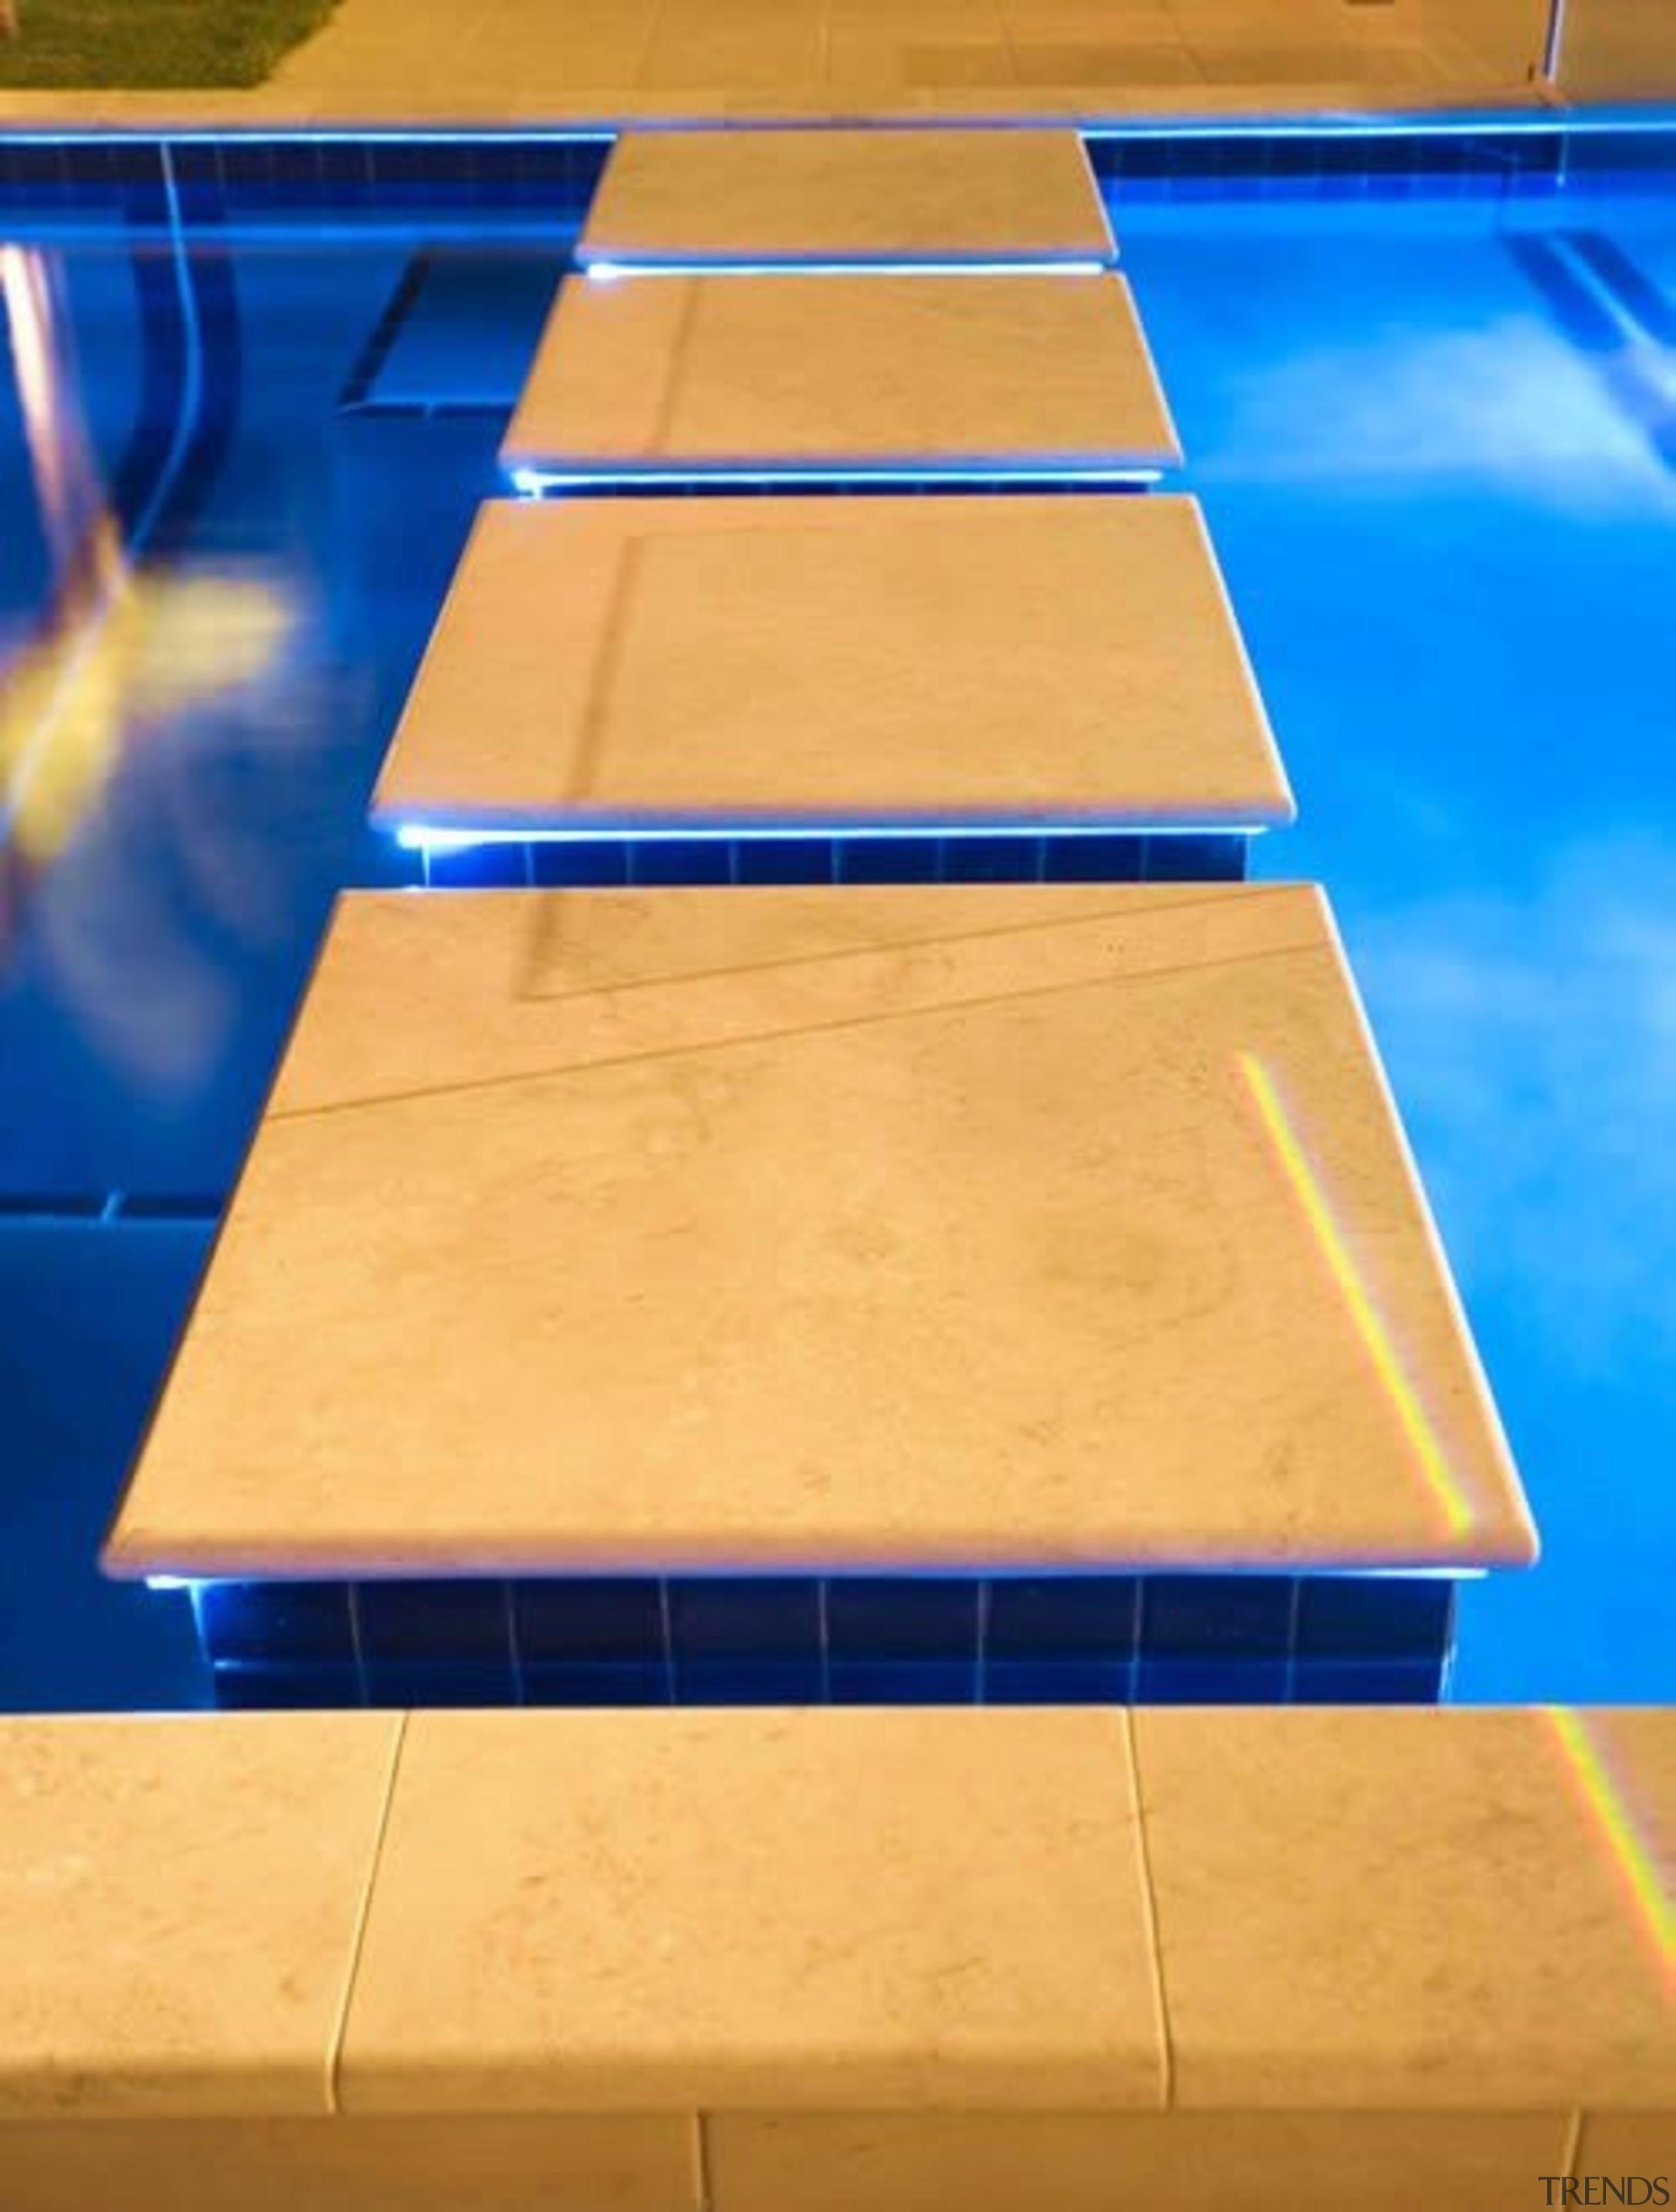 Waterfall - angle | blue | floor | angle, blue, floor, flooring, hardwood, line, material, plywood, structure, table, wood, wood stain, orange